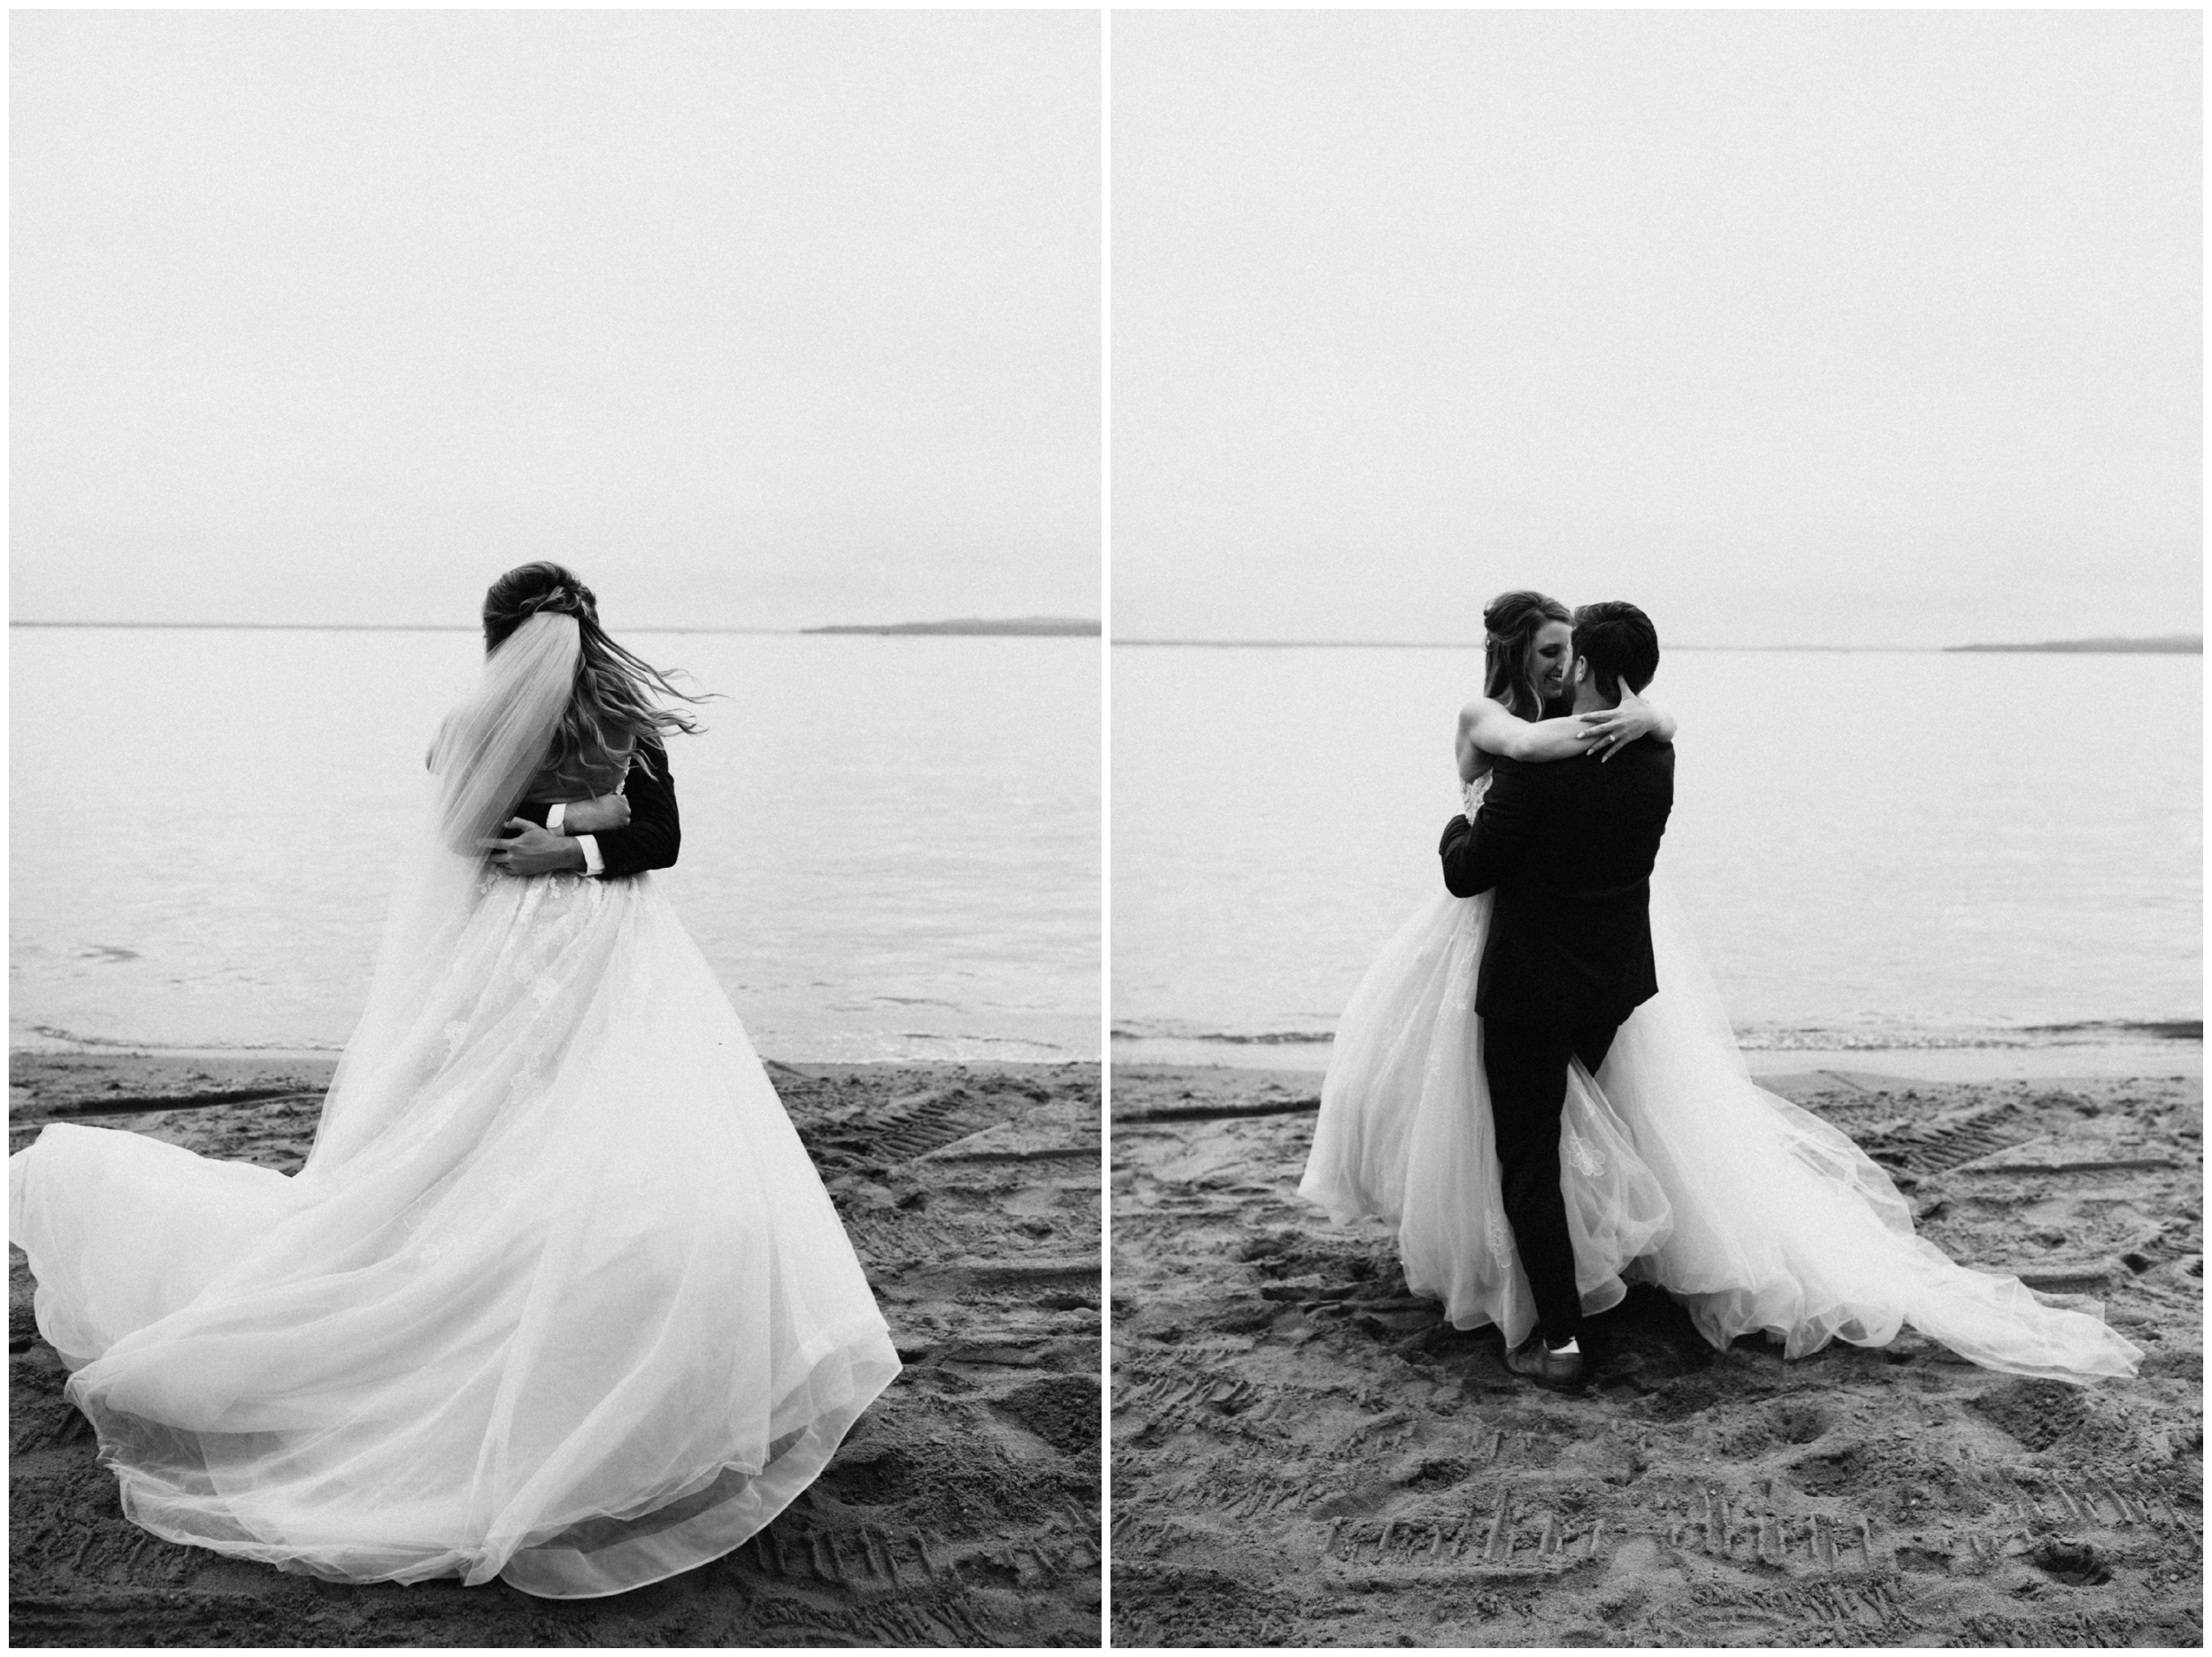 Minnesota lakeside wedding on Gull Lake photographed by Britt DeZeeuw